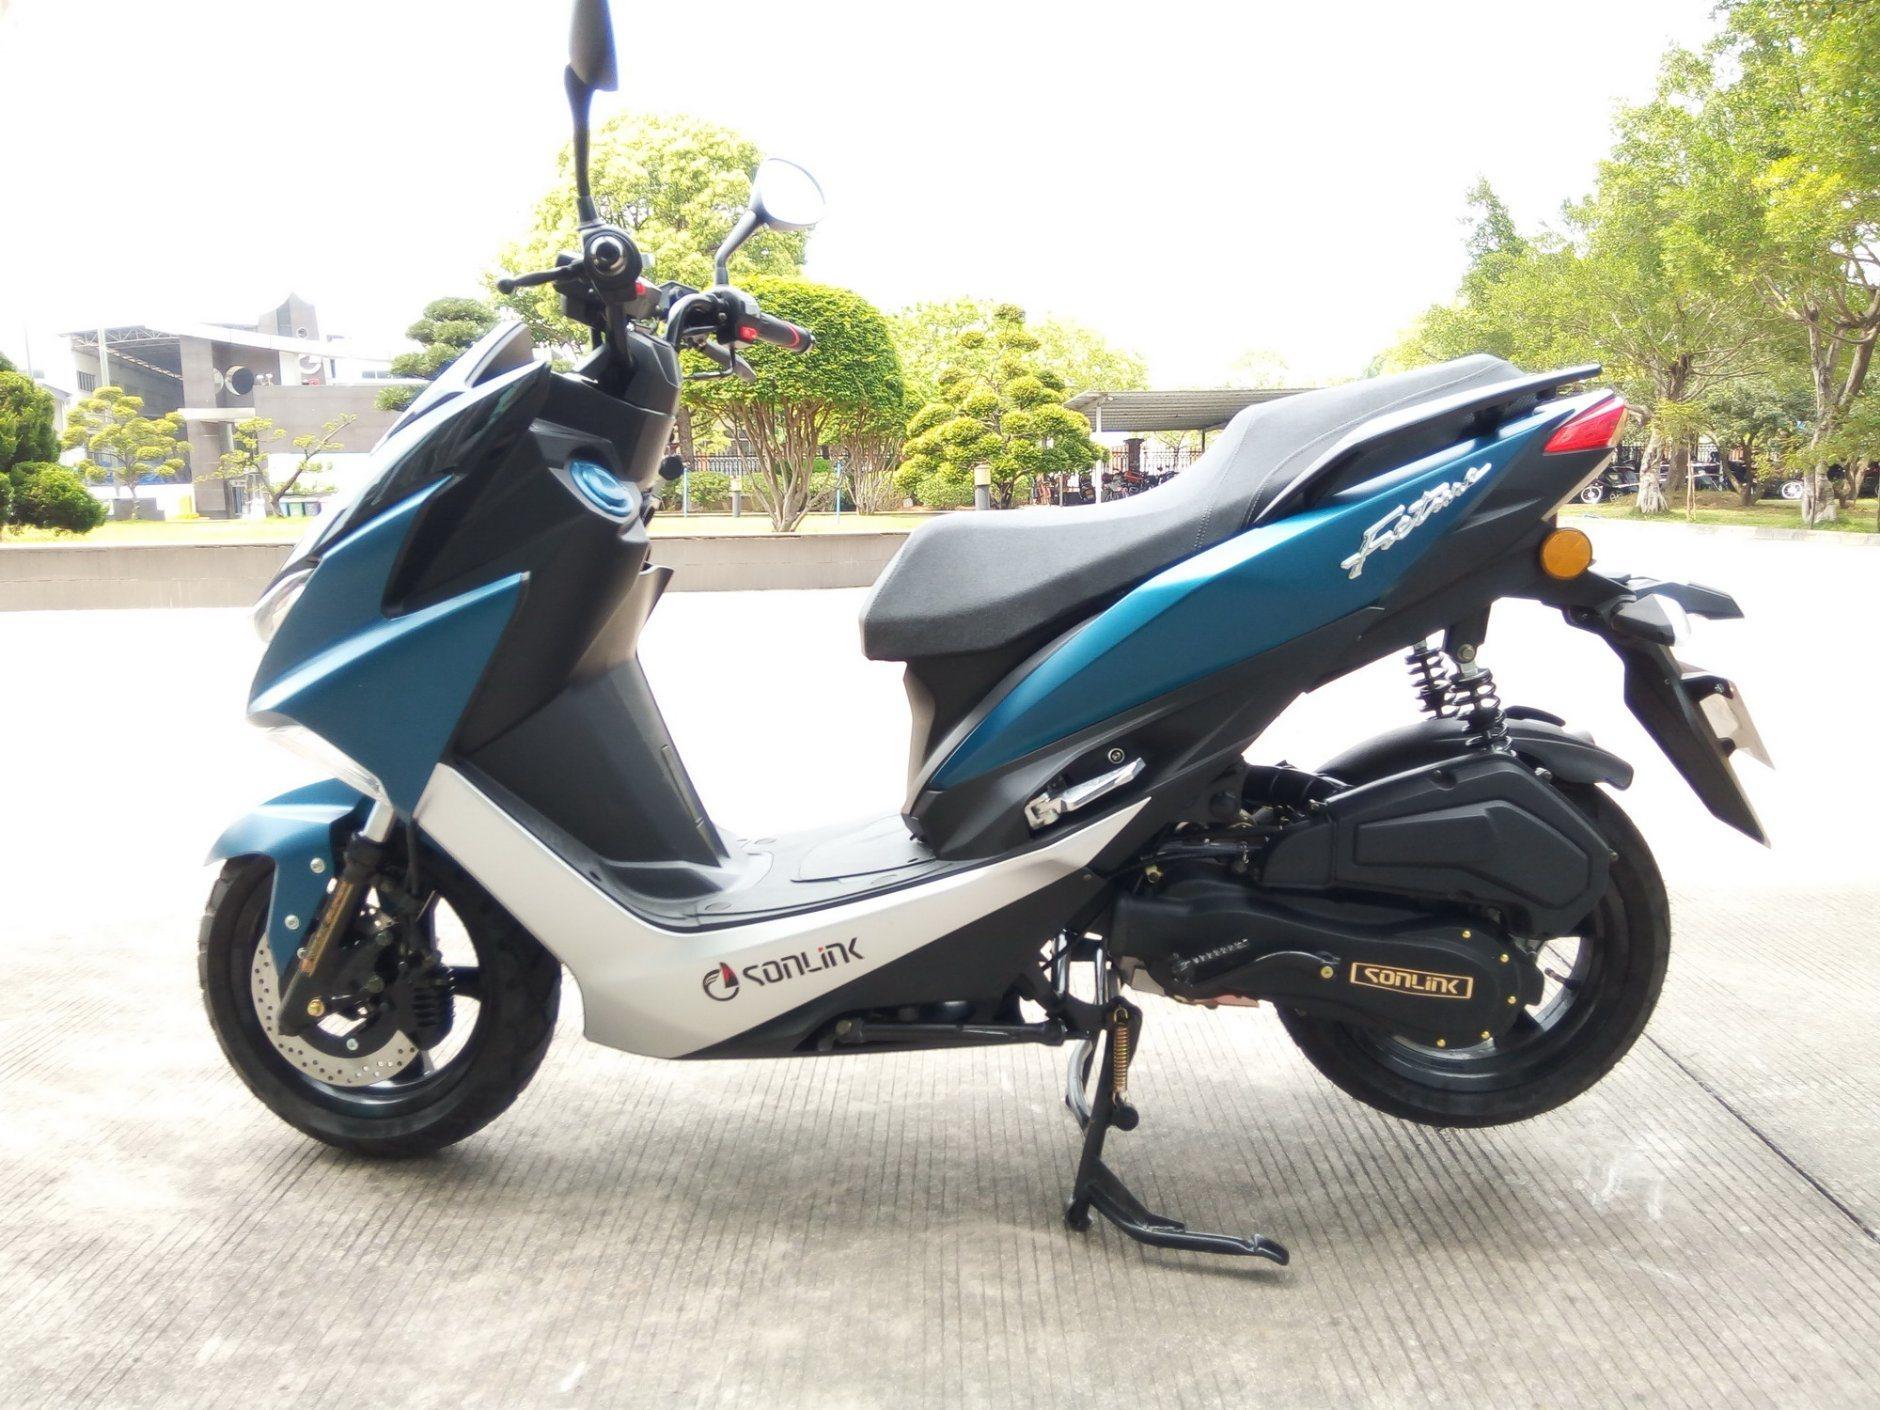 [Hot Item] 50cc/100cc/125cc/150cc EEC YAMAHA Engine Gas Motor Scooter  Motorcycle (SL100T-S5)